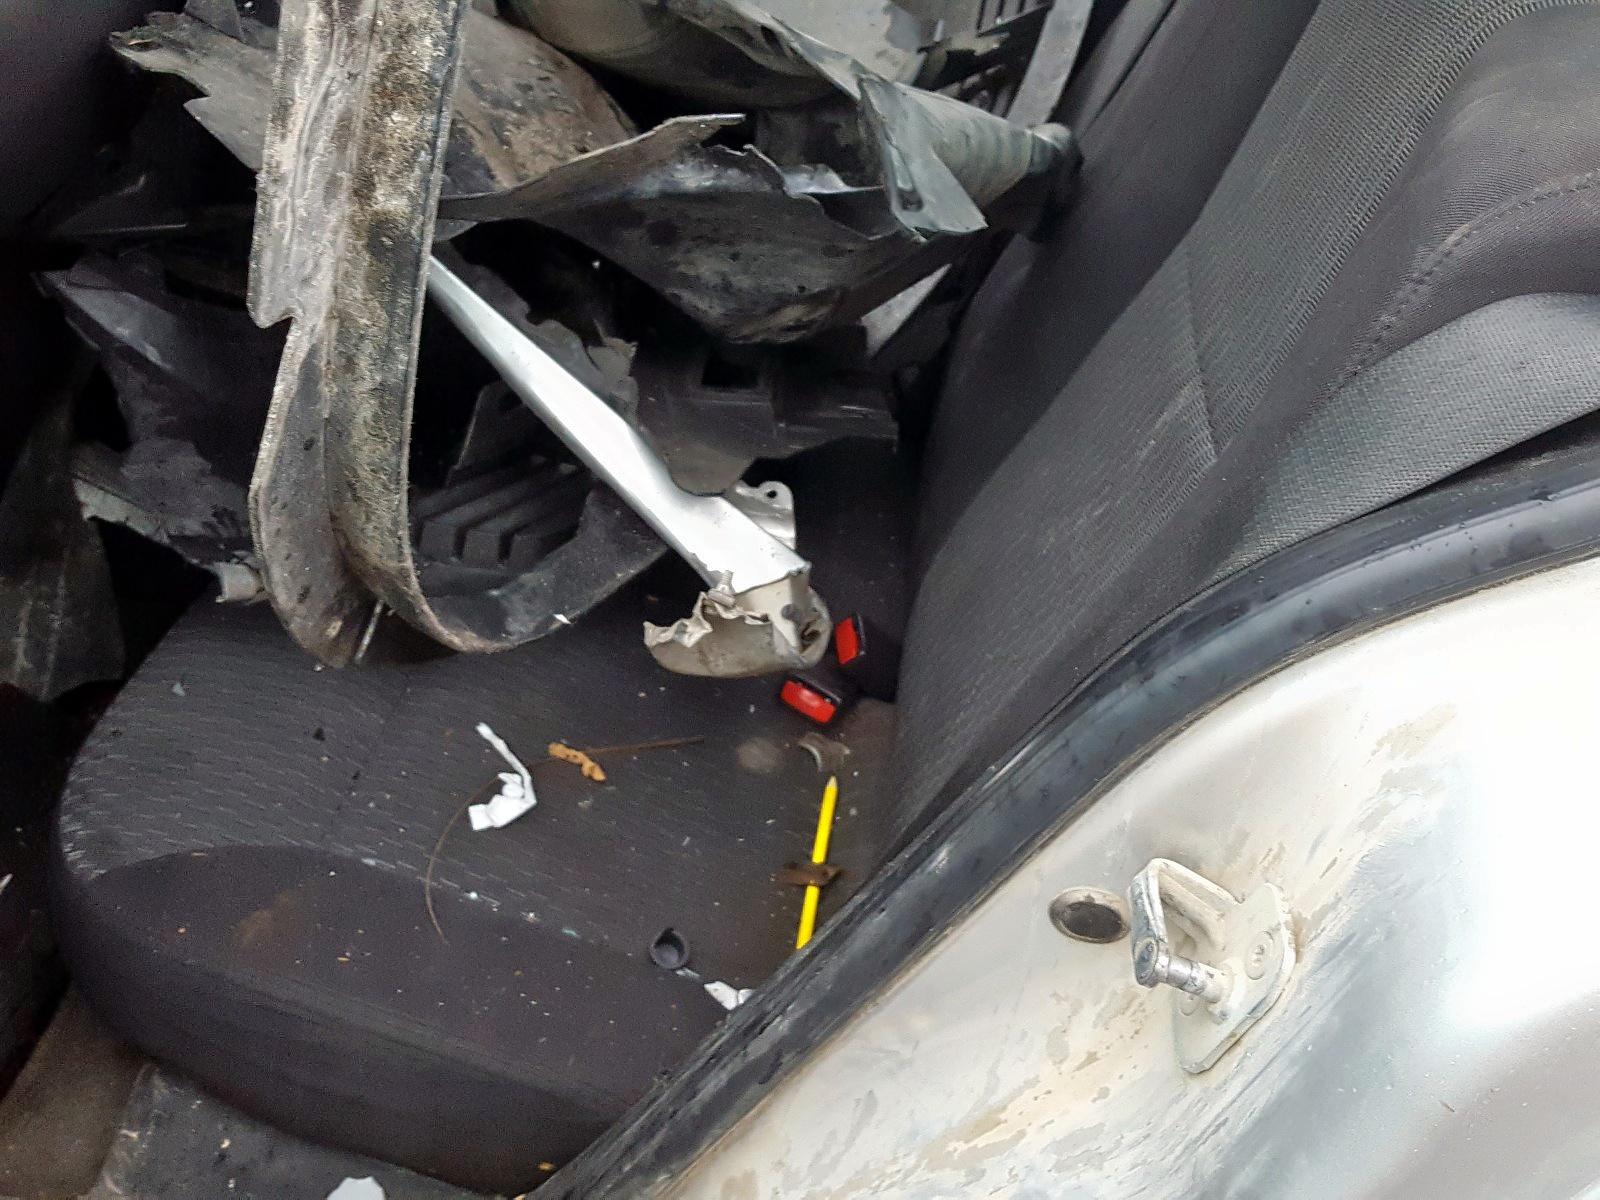 1G1AD5F50A7224606 - 2010 Chevrolet Cobalt 1Lt 2.2L detail view